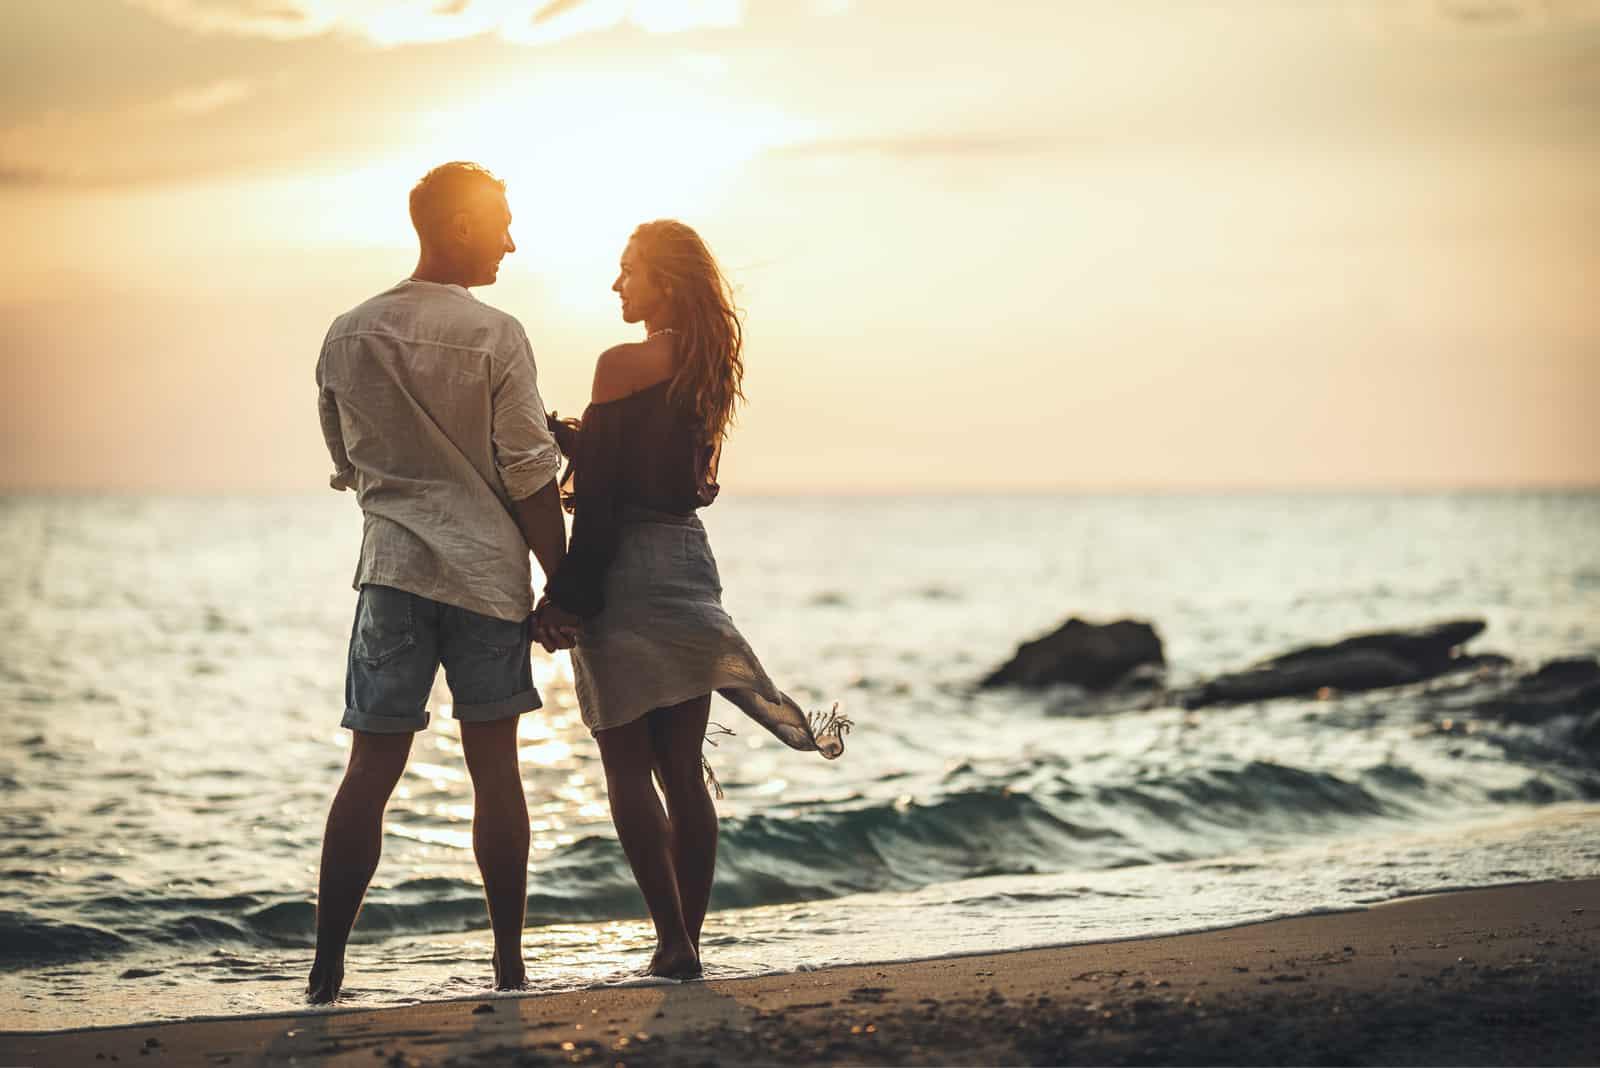 romantic couple at sunset on the beach talking